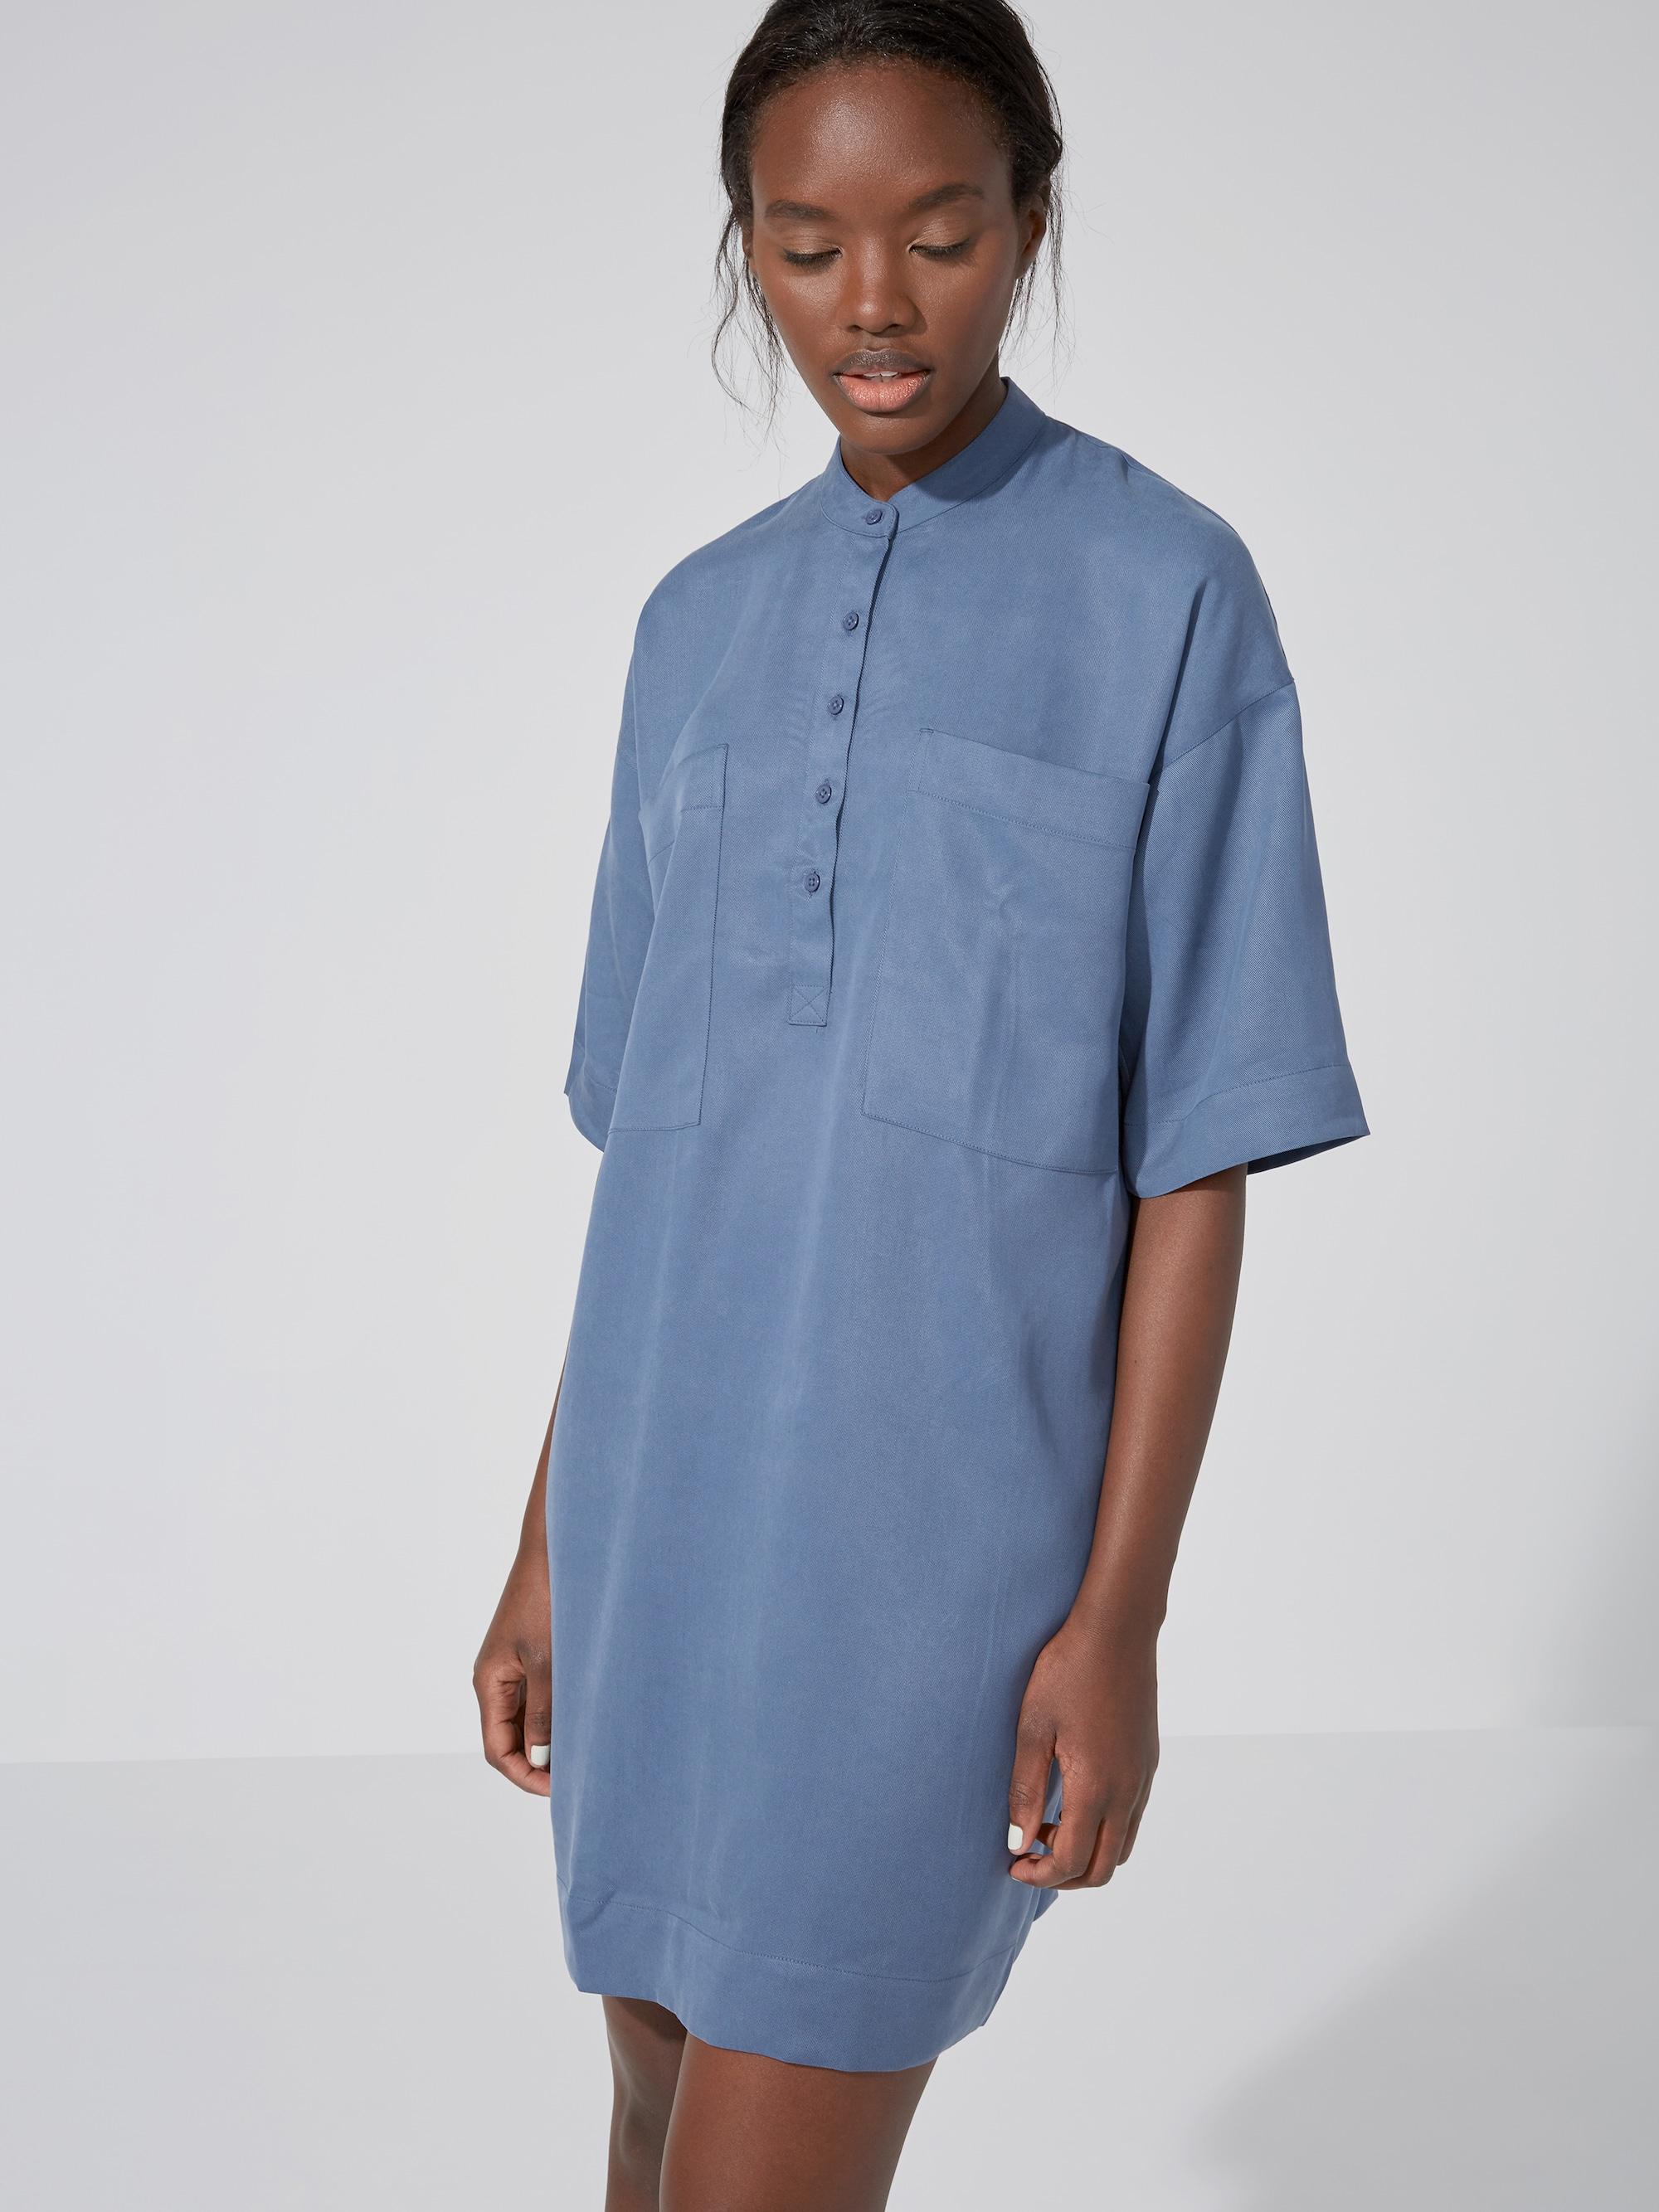 Frank oak the patch tencel shirtdress in vintage indigo for Frank and oak shirt